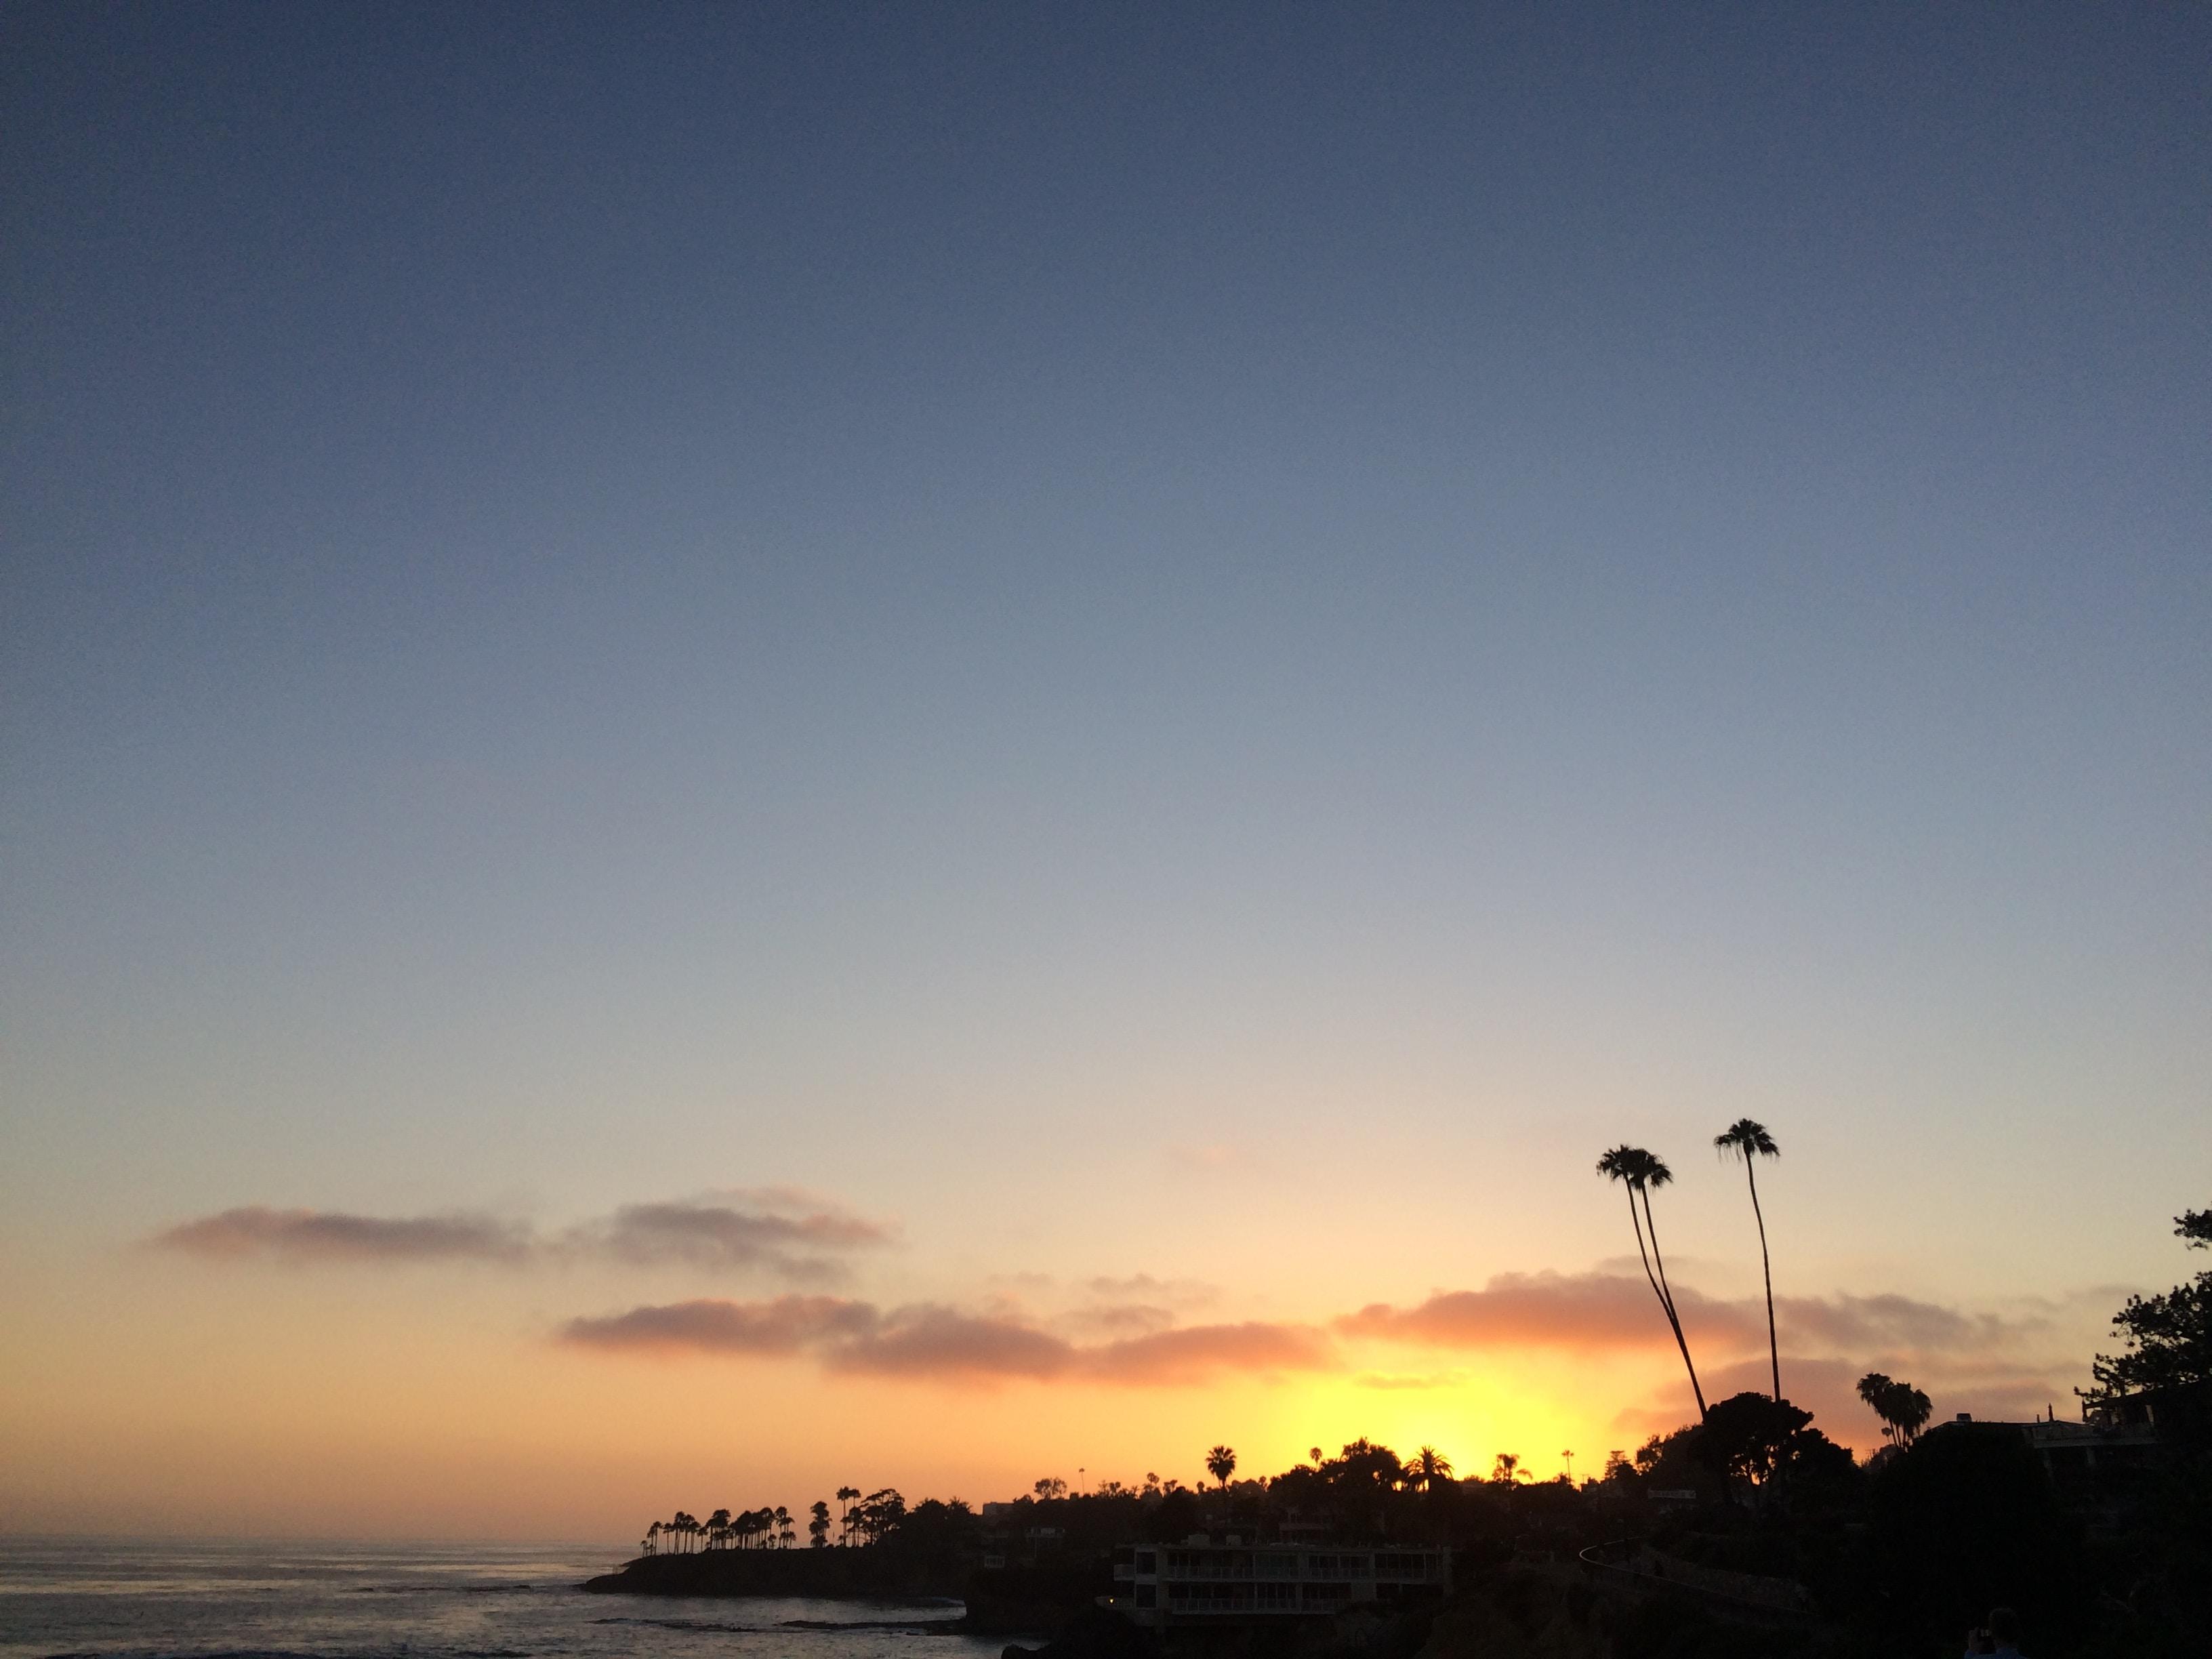 Coast silhouette in Myrtle / Cliff, Laguna Beach, California, United States at sunset